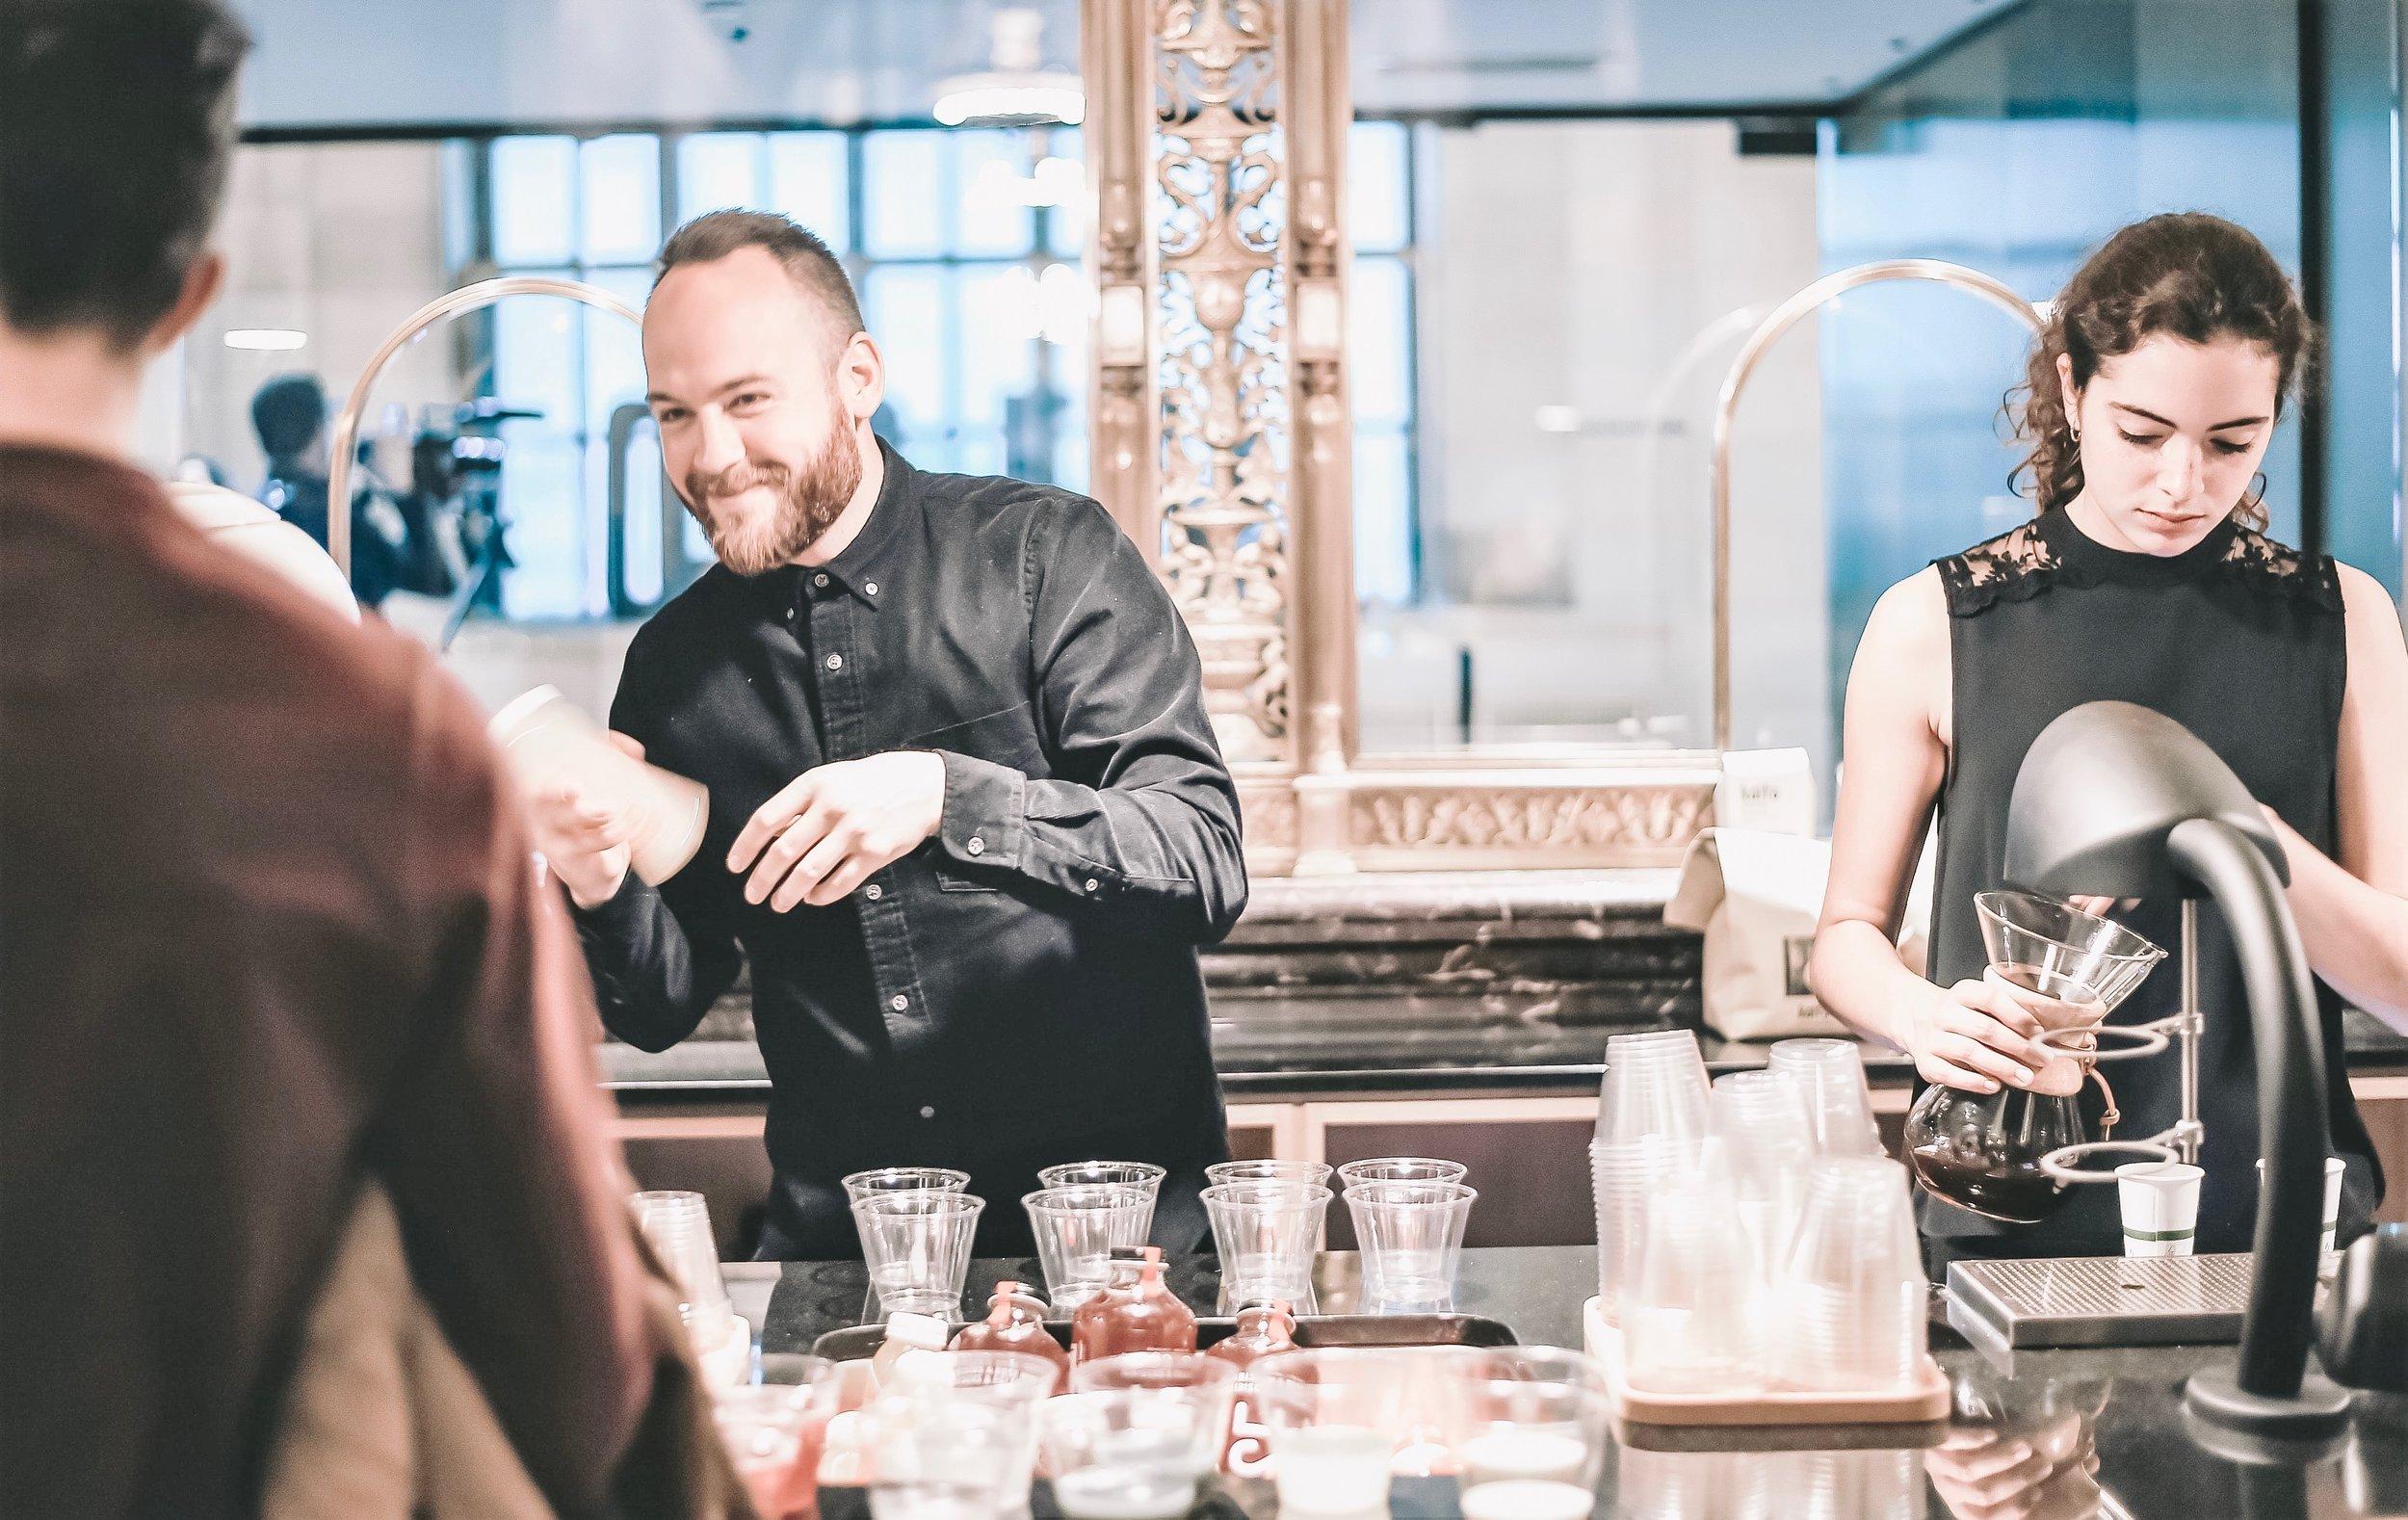 coffee-bar-customer-Experience-min.JPG